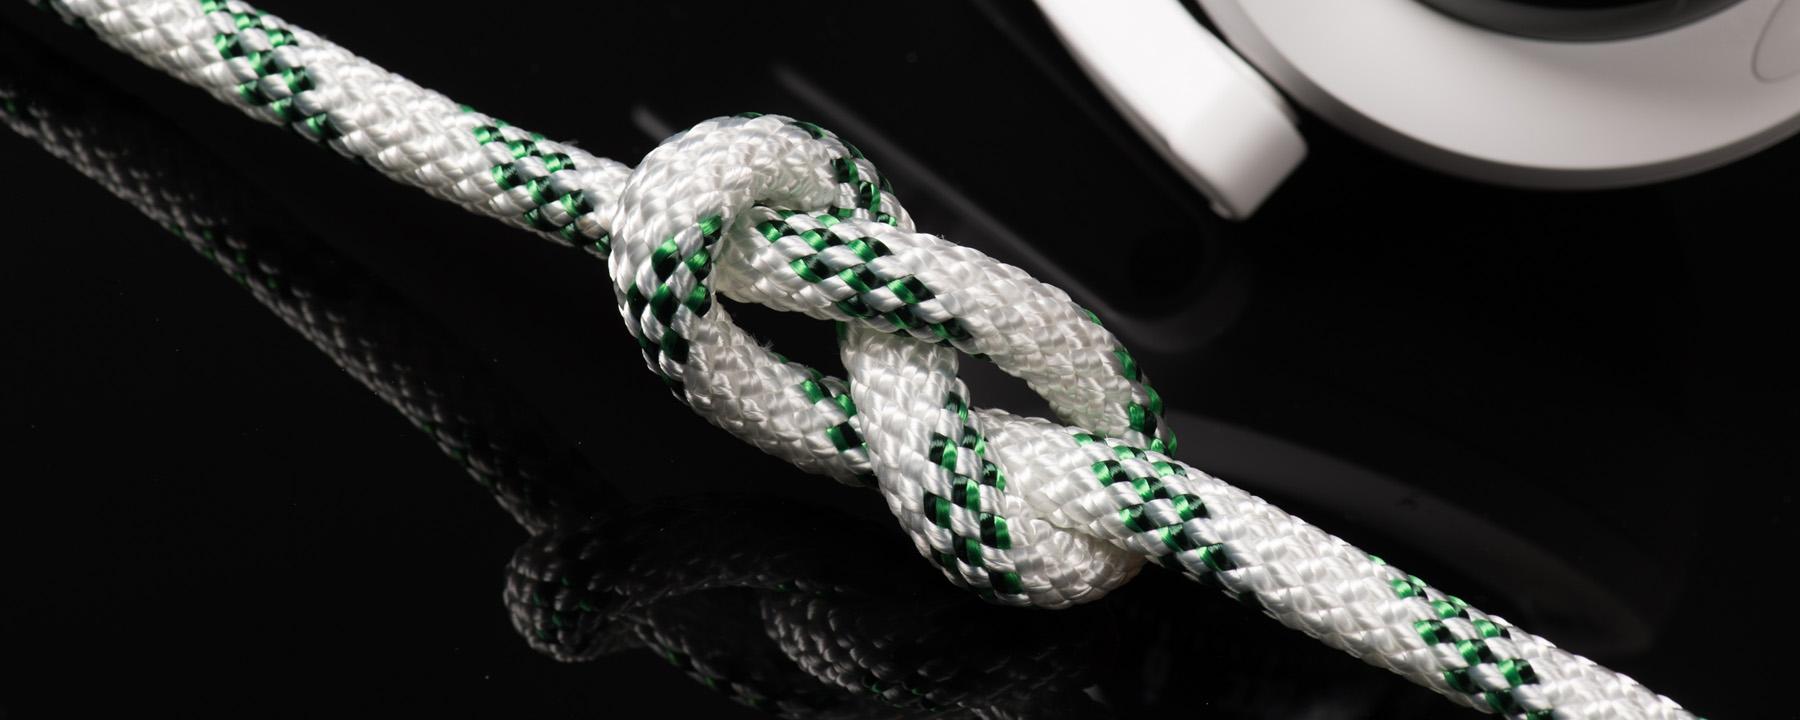 Equinoxe blanc vert